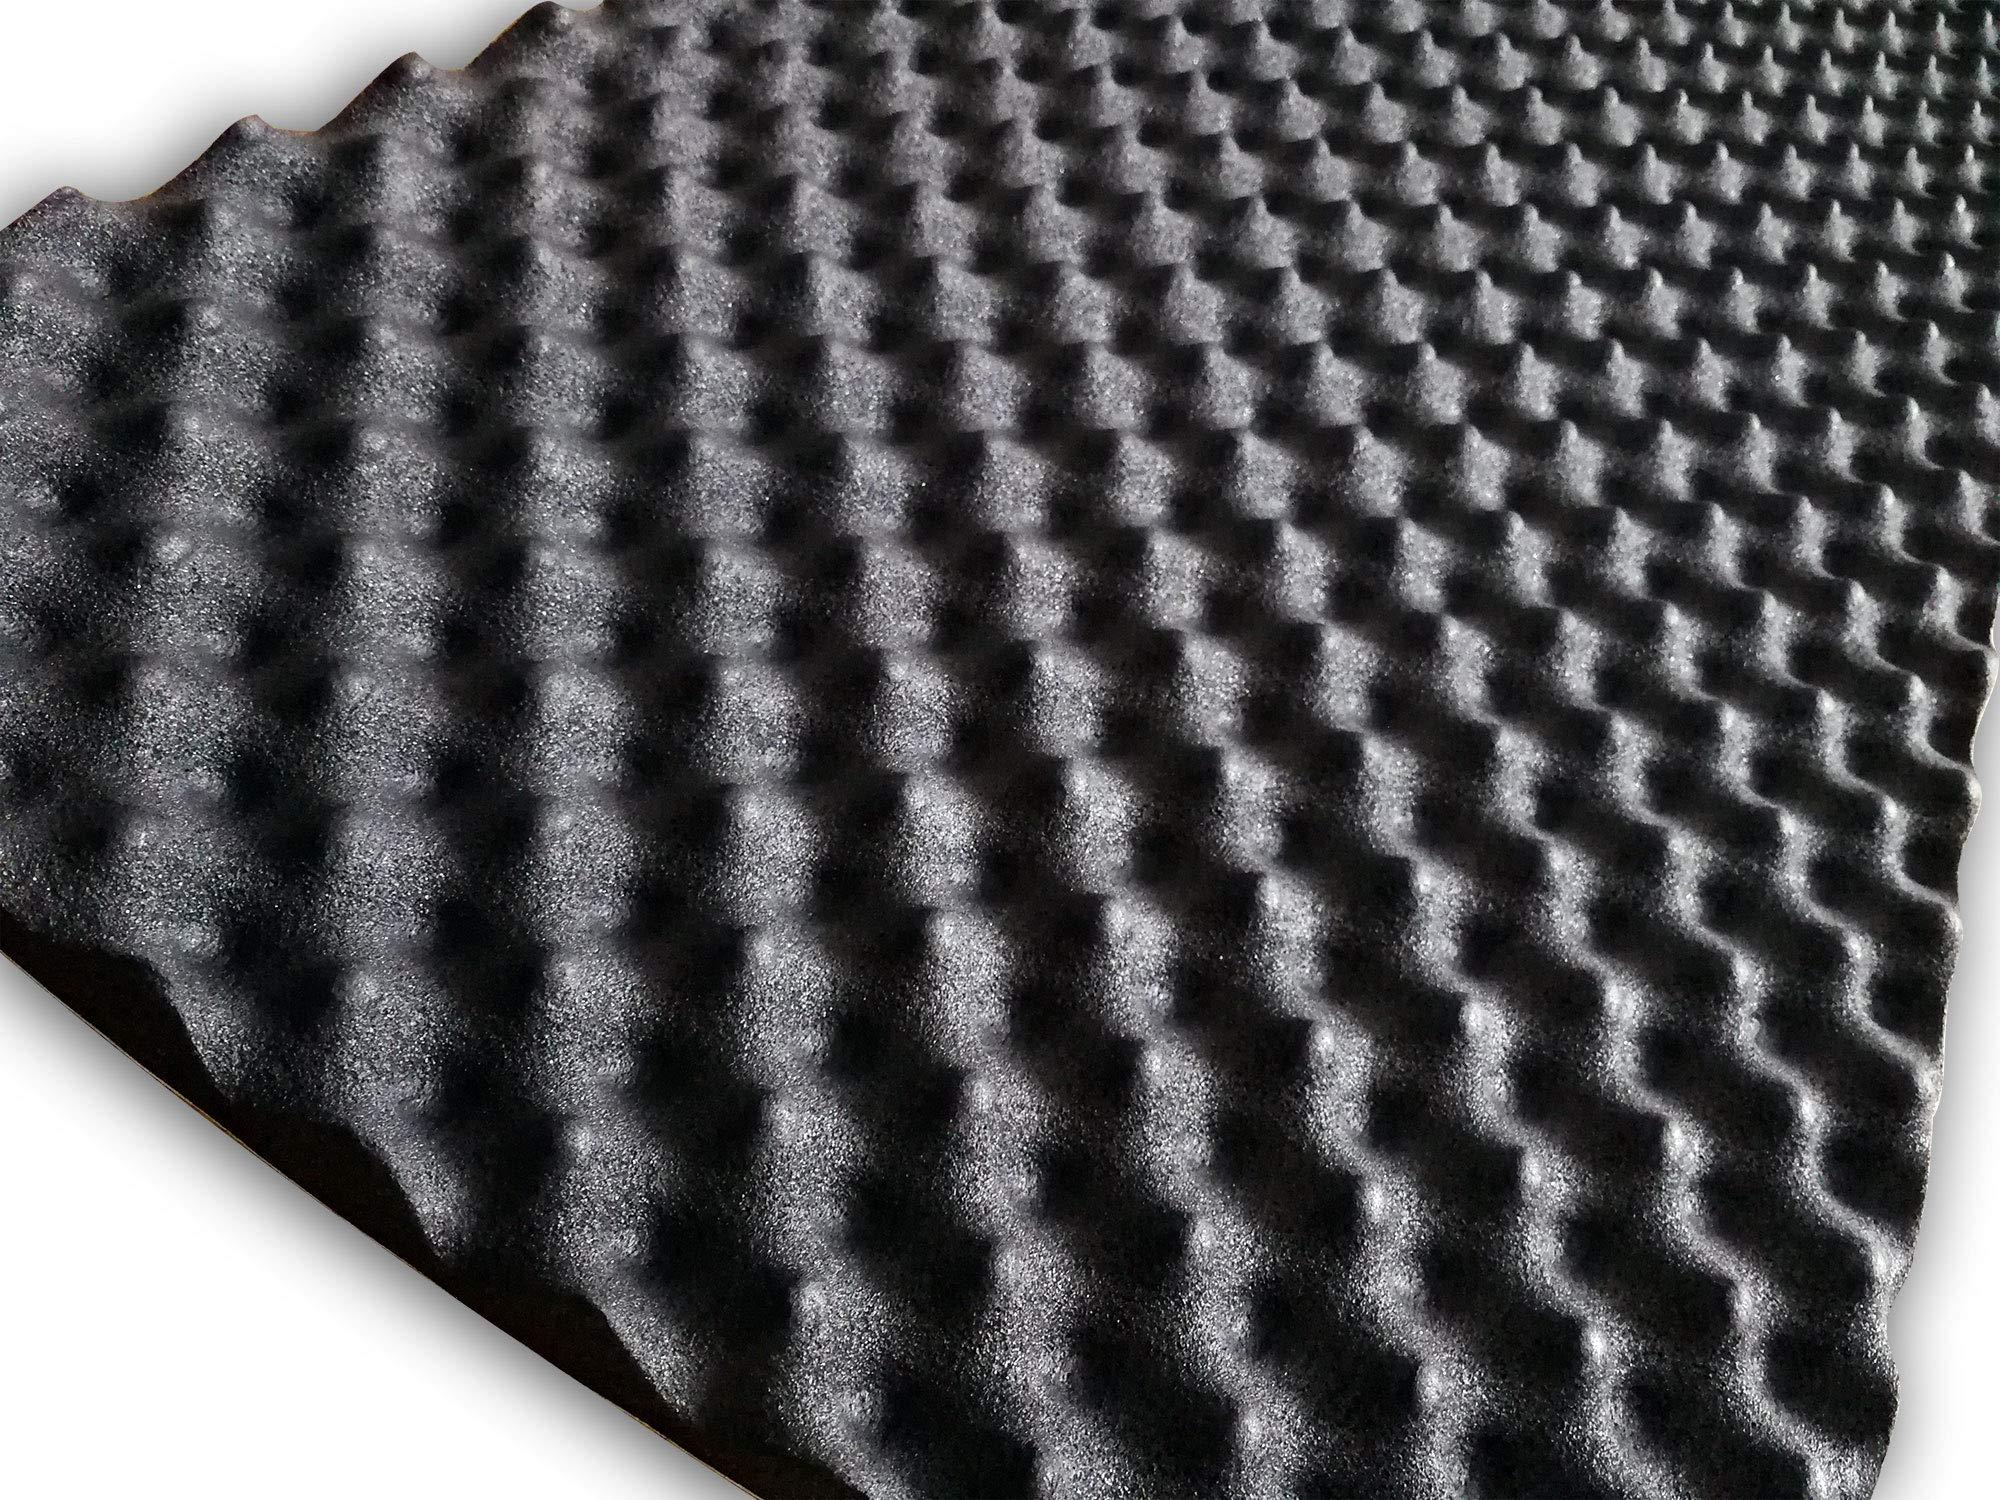 SOOMJ 10 Pack Studio Sound Acoustic Absorption Car Heatproof Foam Deadener 19.7''x31.5''